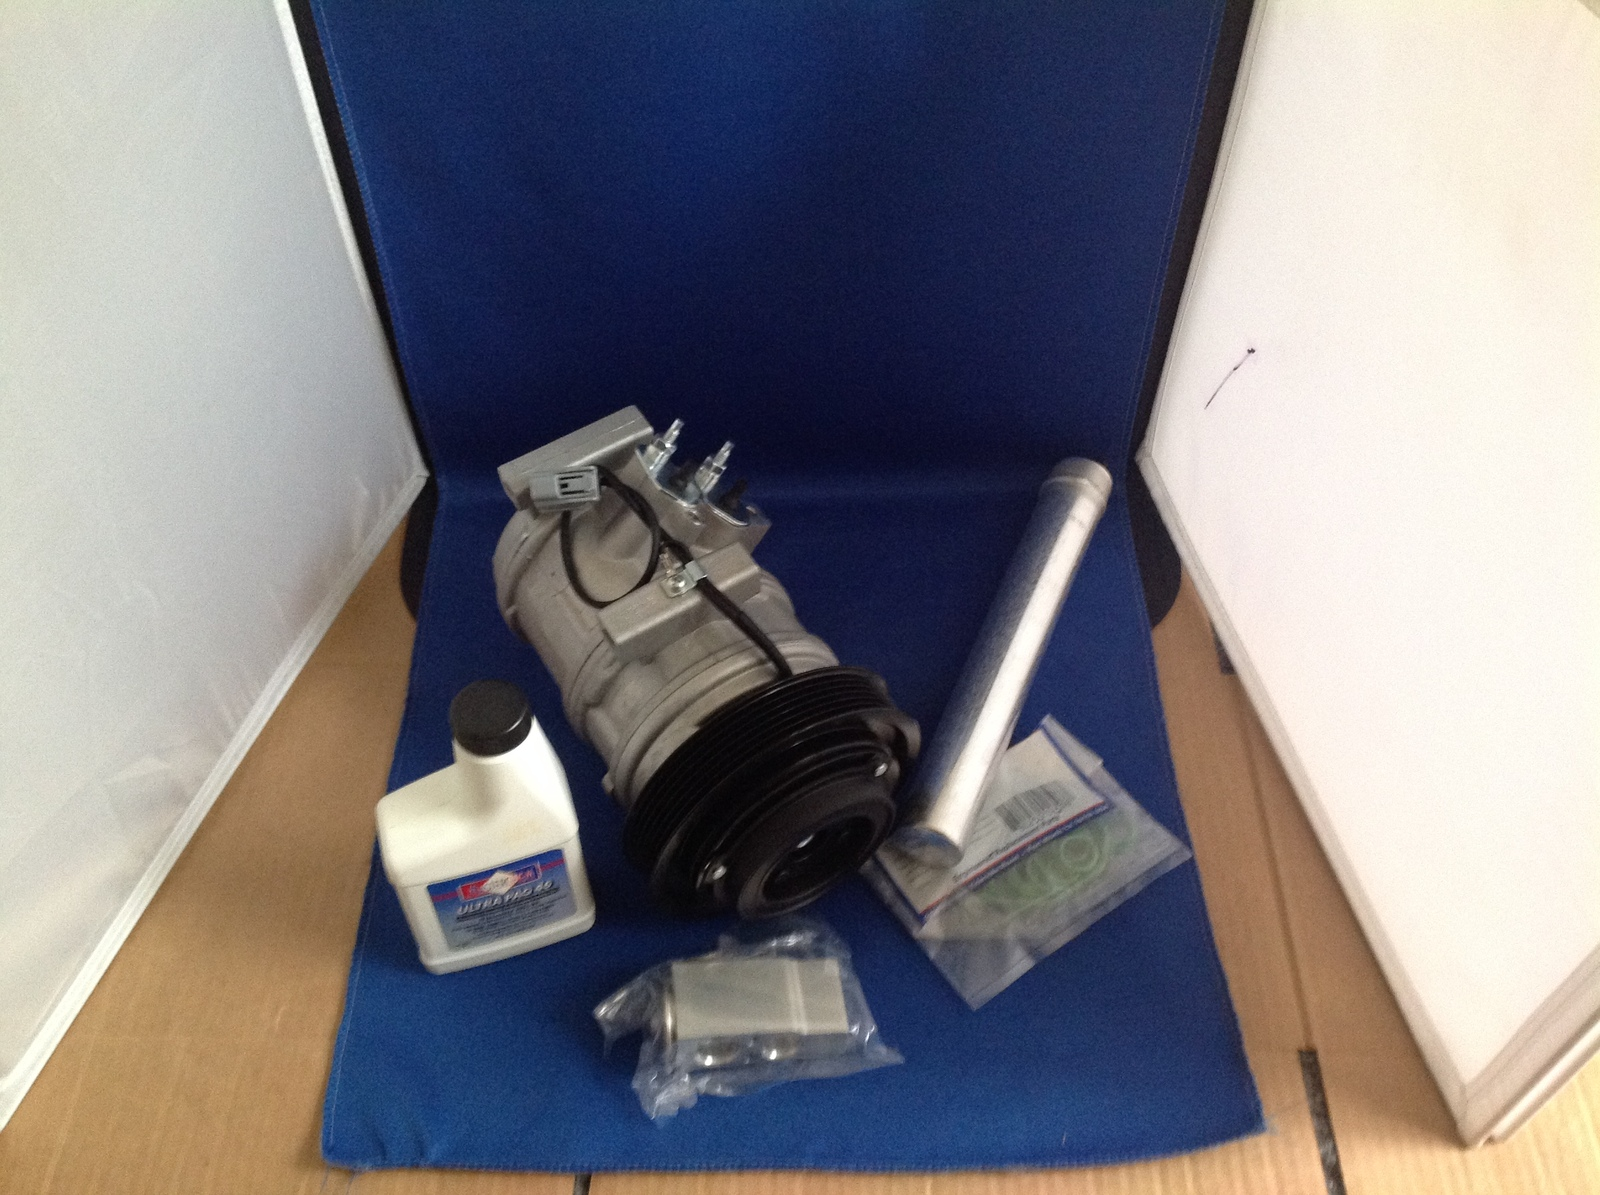 03 07 honda accord v6 3.0 ac air conditioning compressor kit